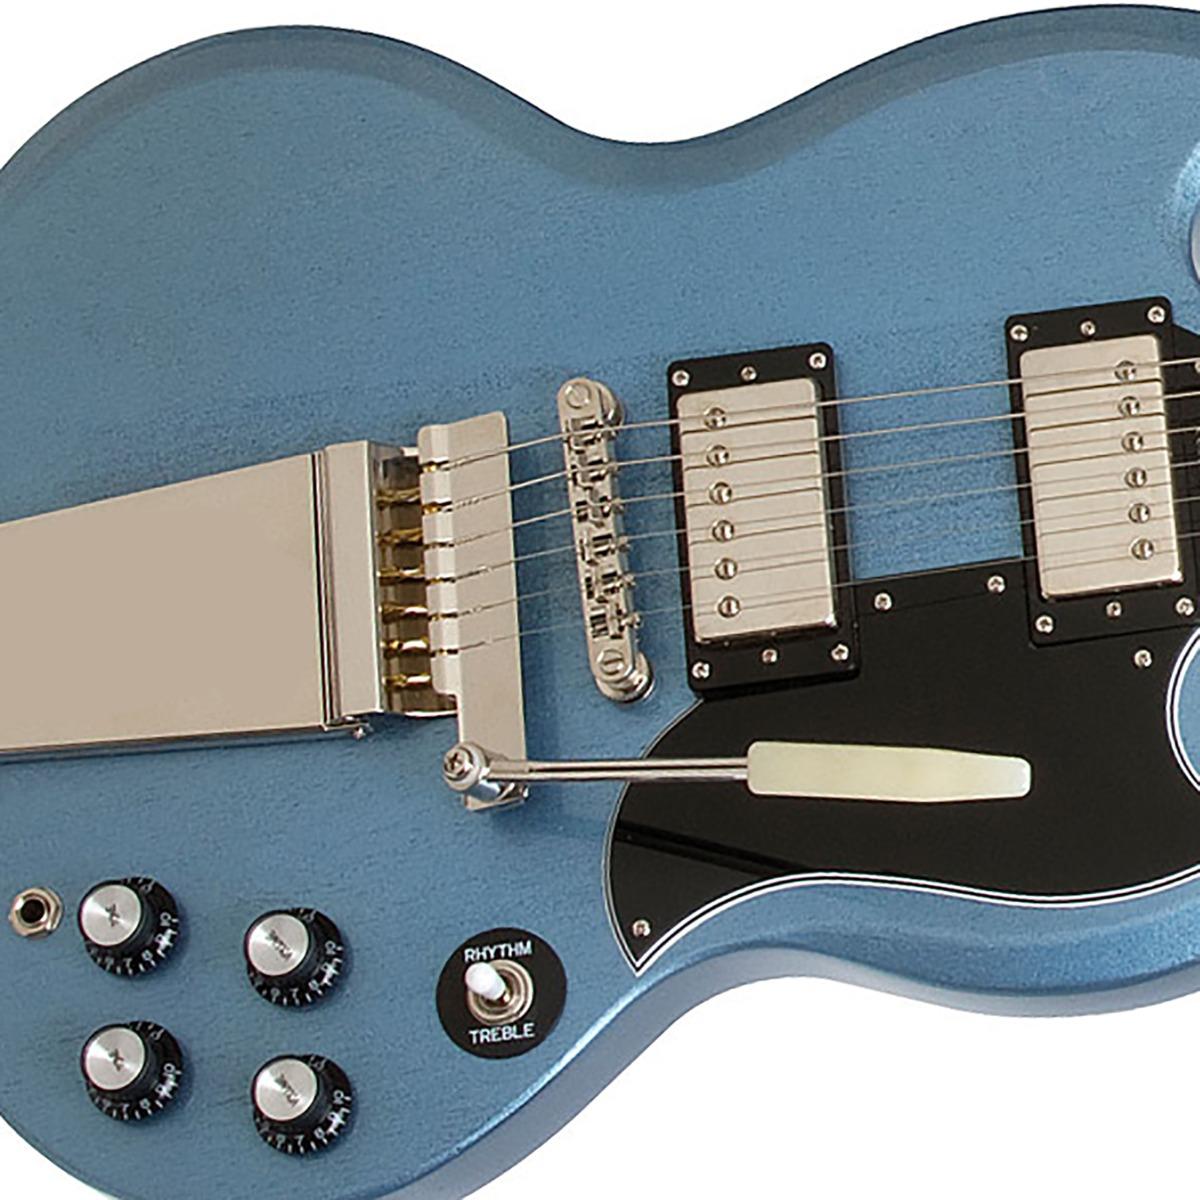 epiphone ltd ed sg custom electric guitar with maestro tremelo tv pelham blue ebay. Black Bedroom Furniture Sets. Home Design Ideas